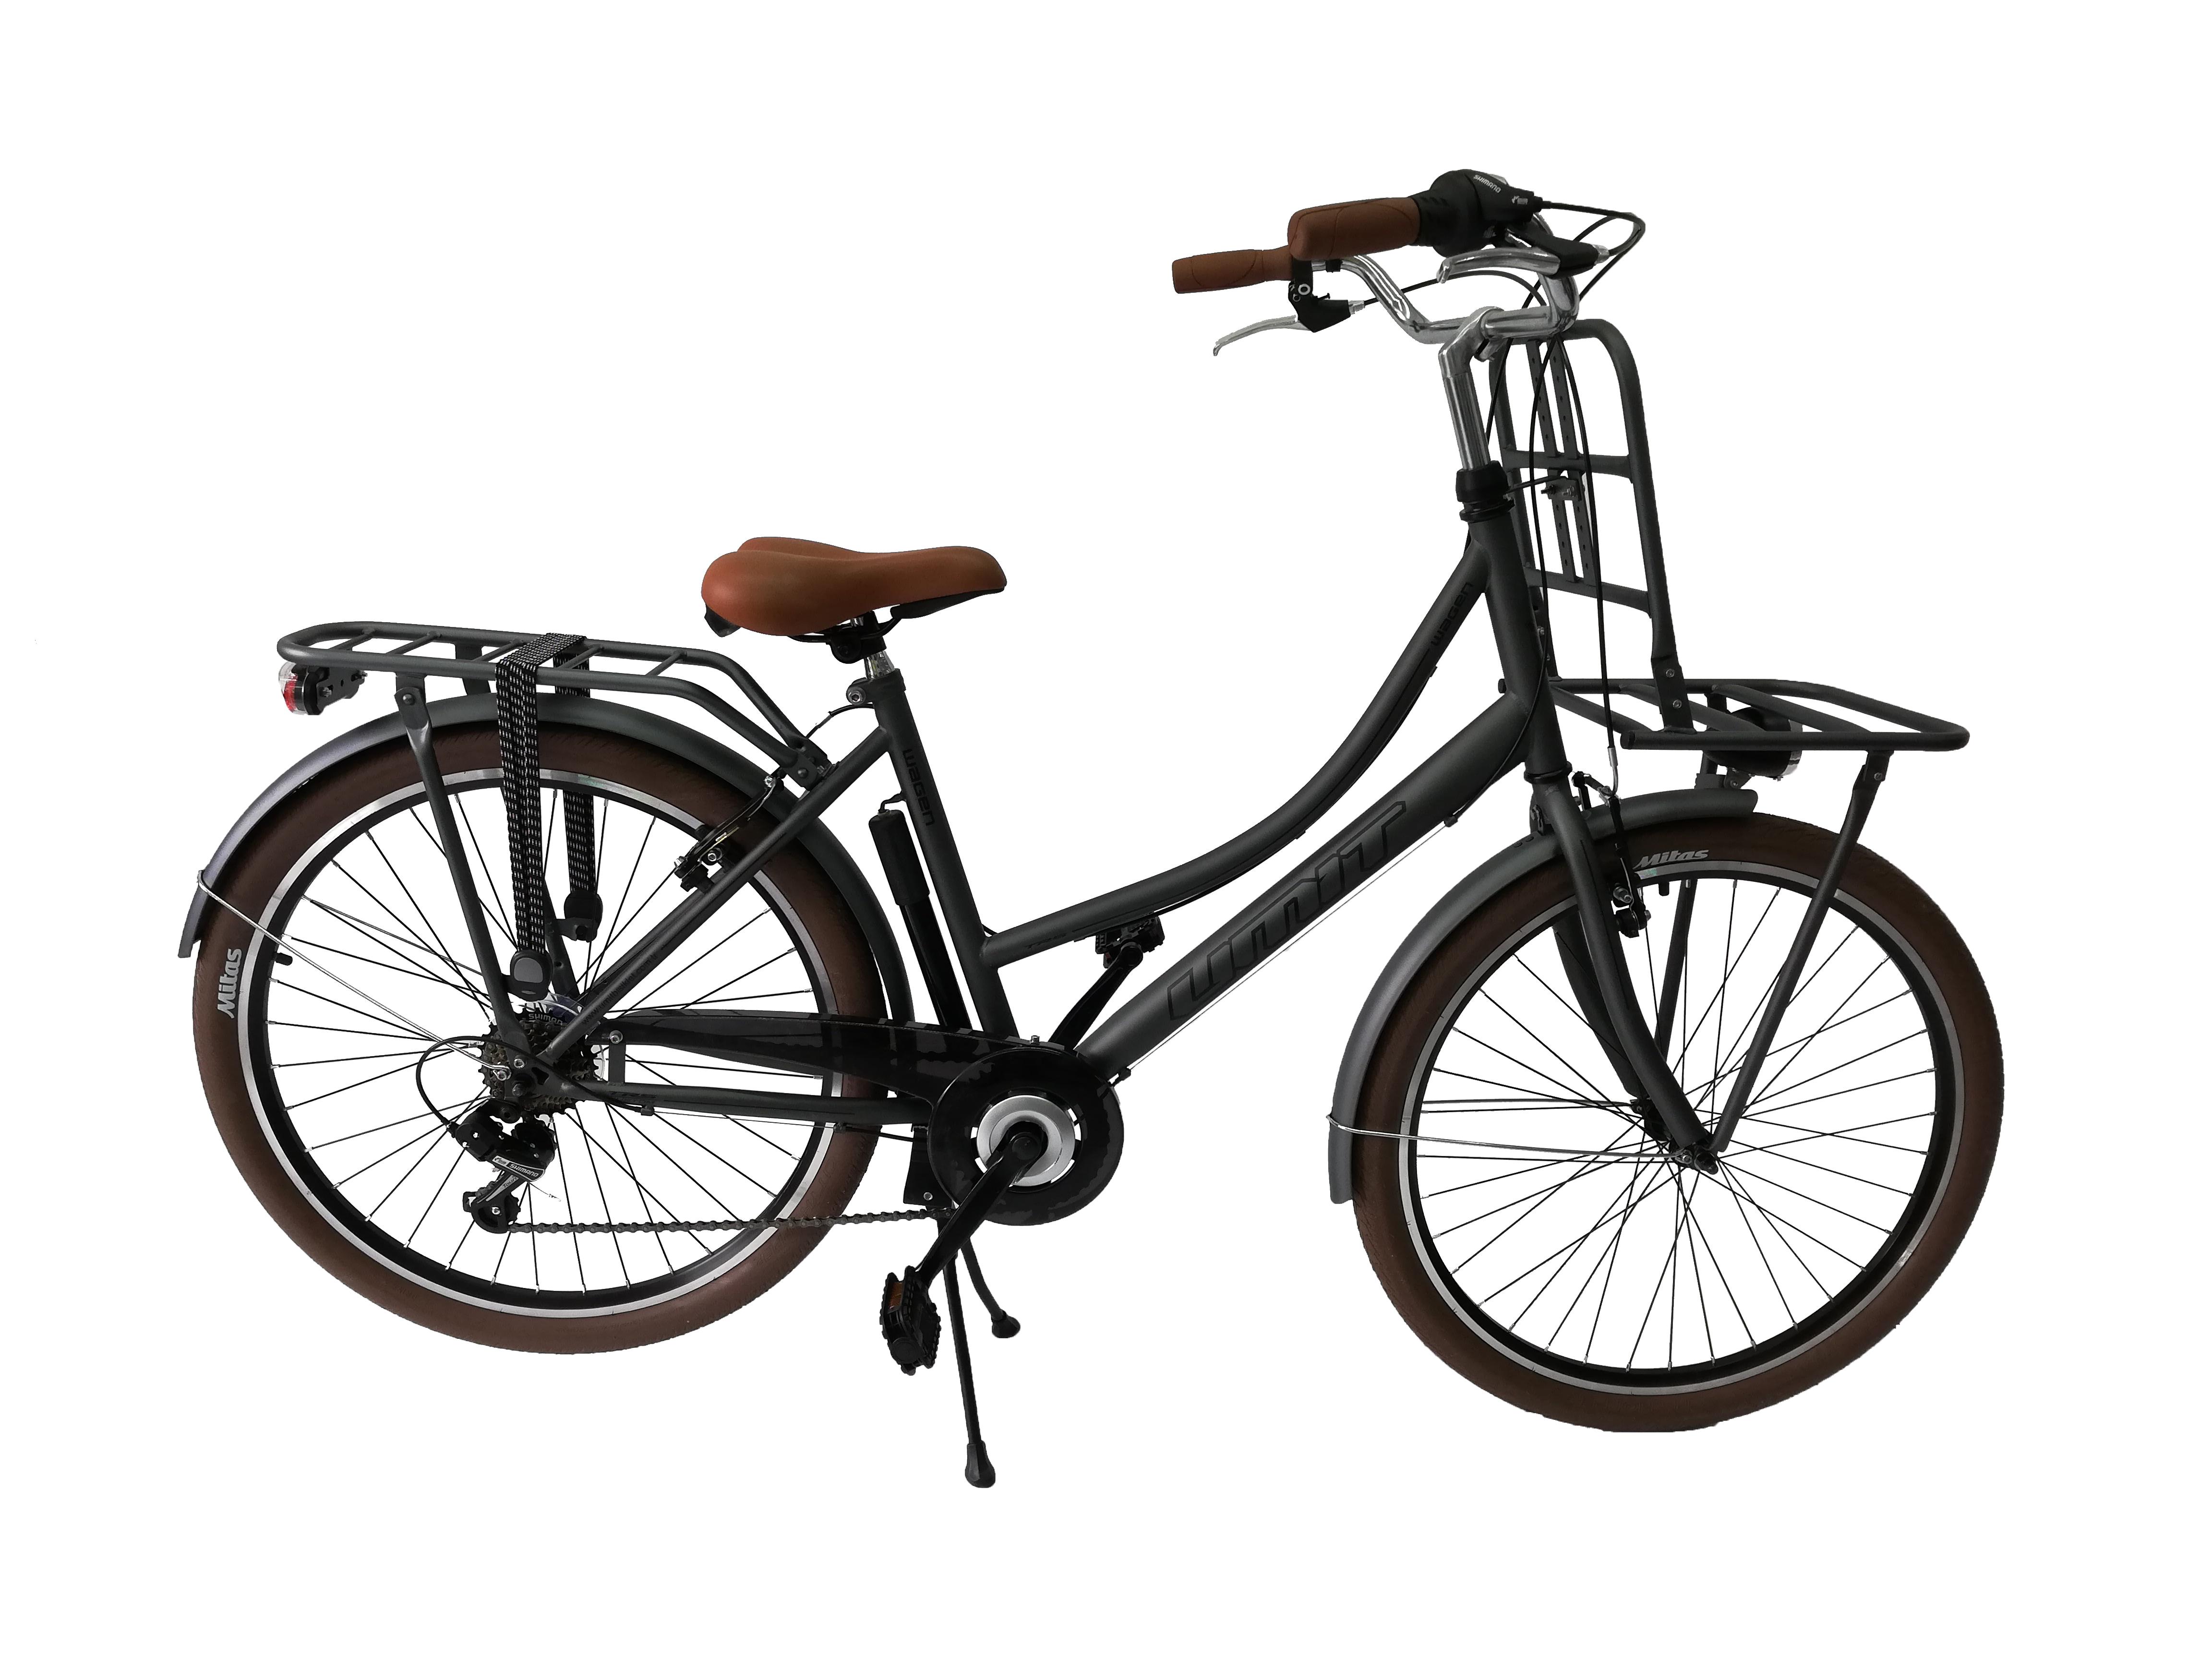 "Bicicleta City Umit Wagen Lady, Culoare Gri, Roata 26"" Otel [0]"